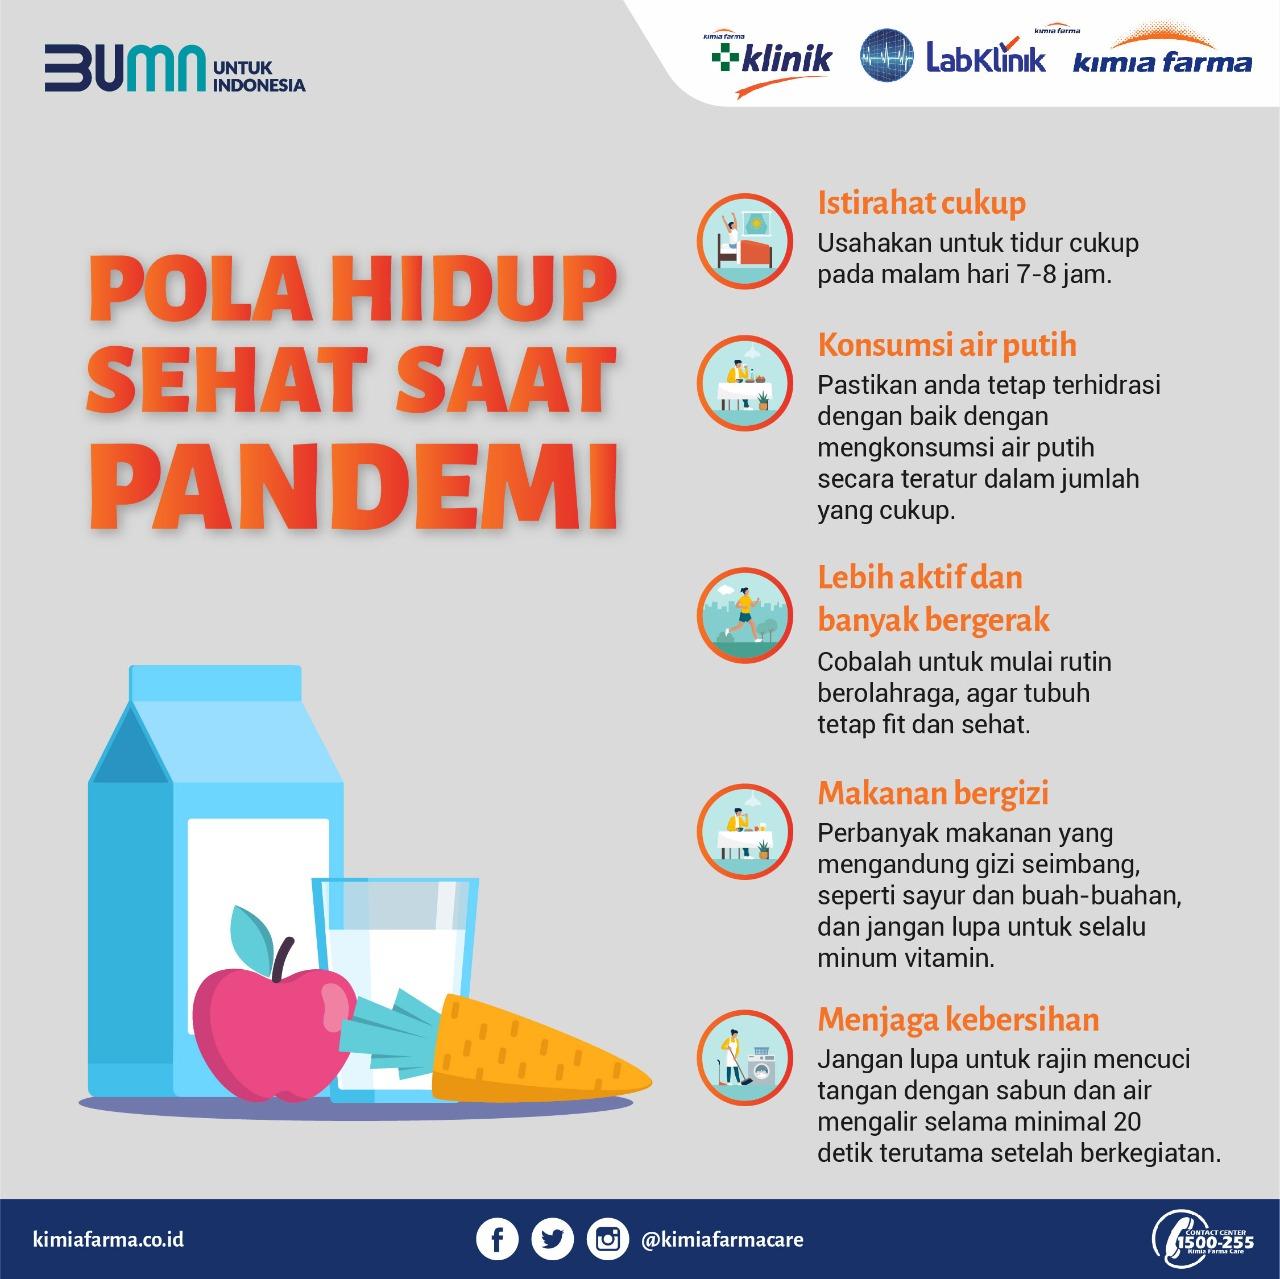 Pola hidup sehat saat pandemi